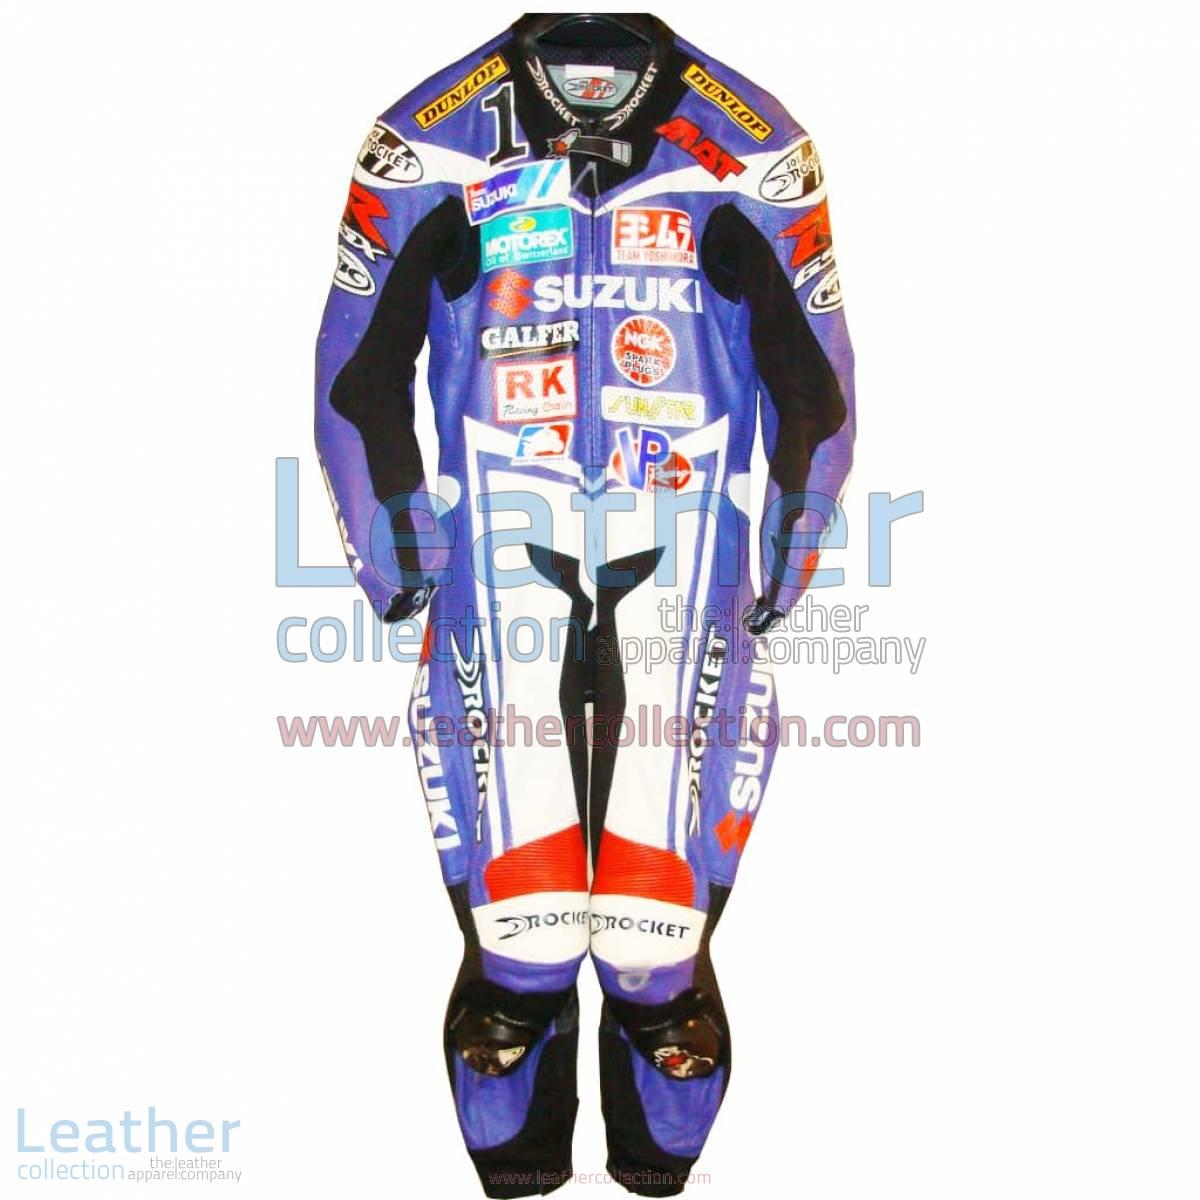 Mat Mladin Suzuki AMA 2005 Leather Suit   suzuki leather suit